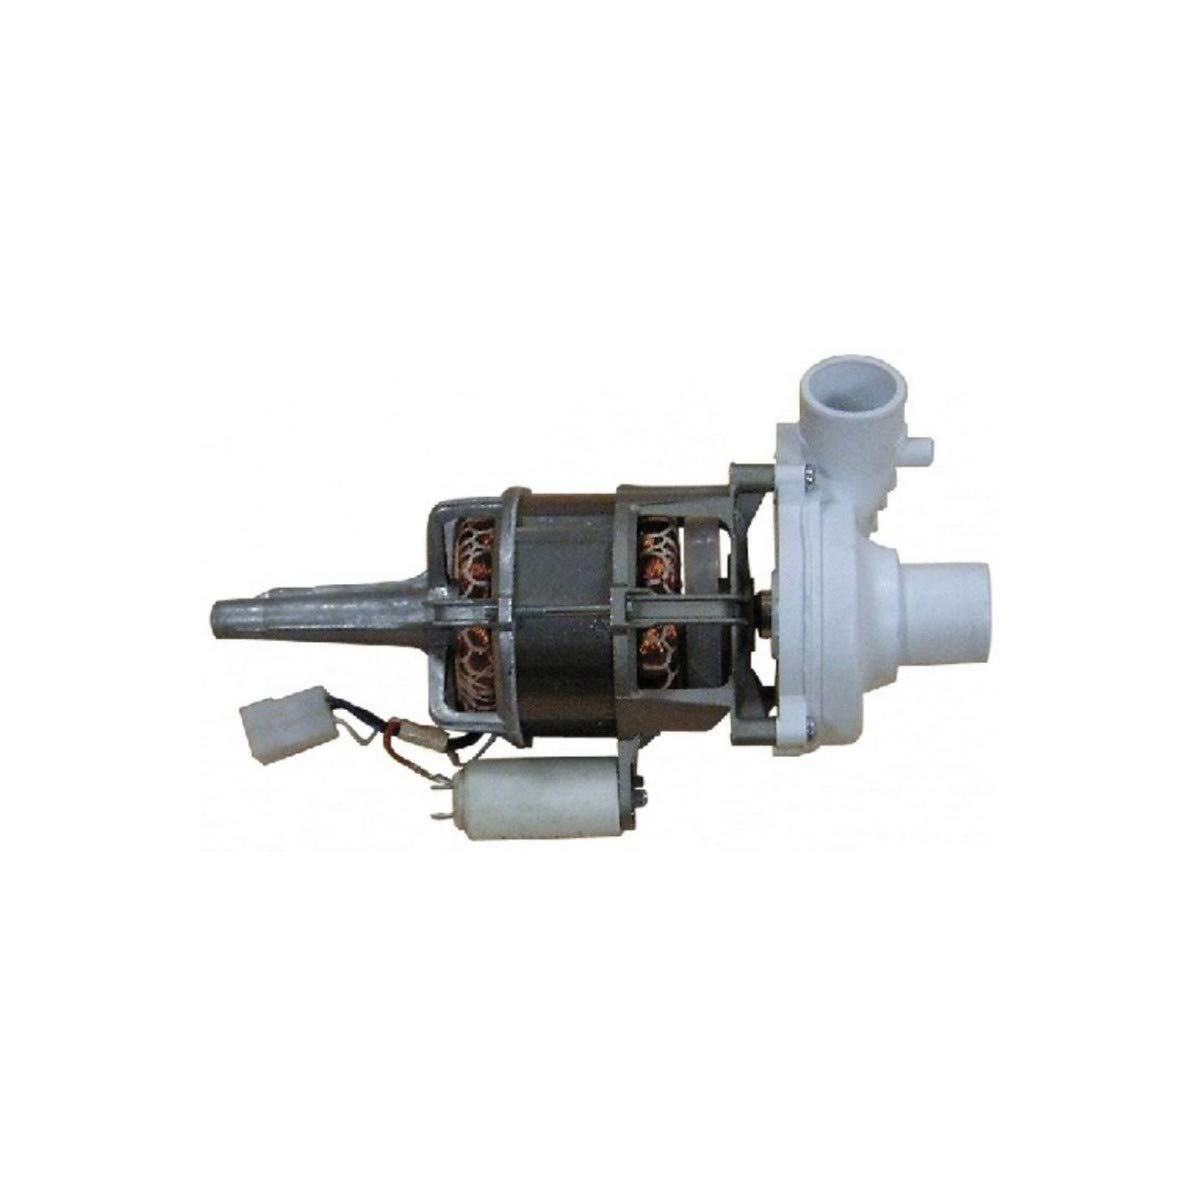 Recamania Motor lavavajillas Otsein 220/240V 50Hz LVO4750 91207001 ...